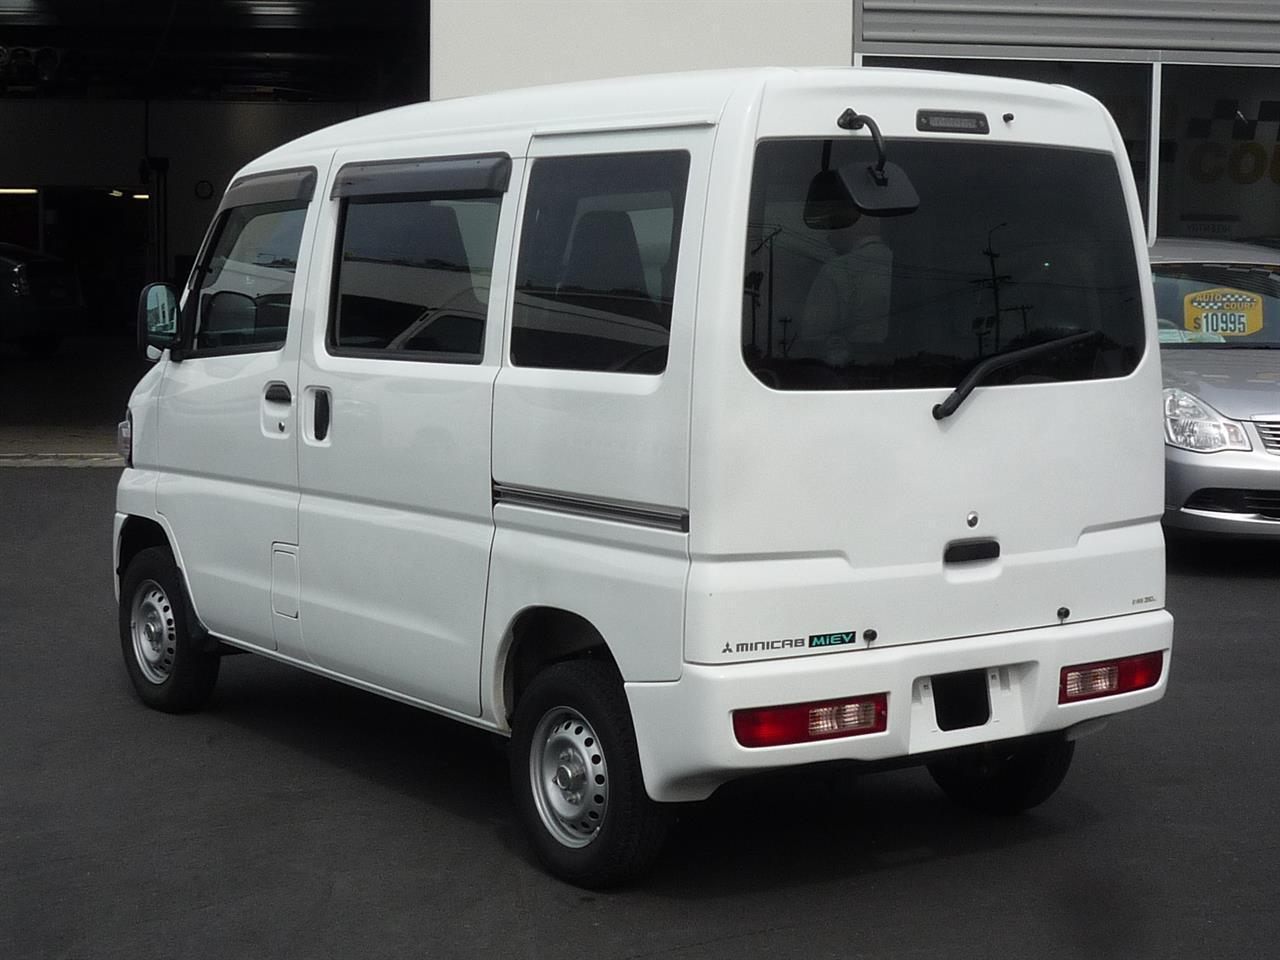 image-17, 2013 Mitsubishi MiniCab MiEV Electric Van at Dunedin